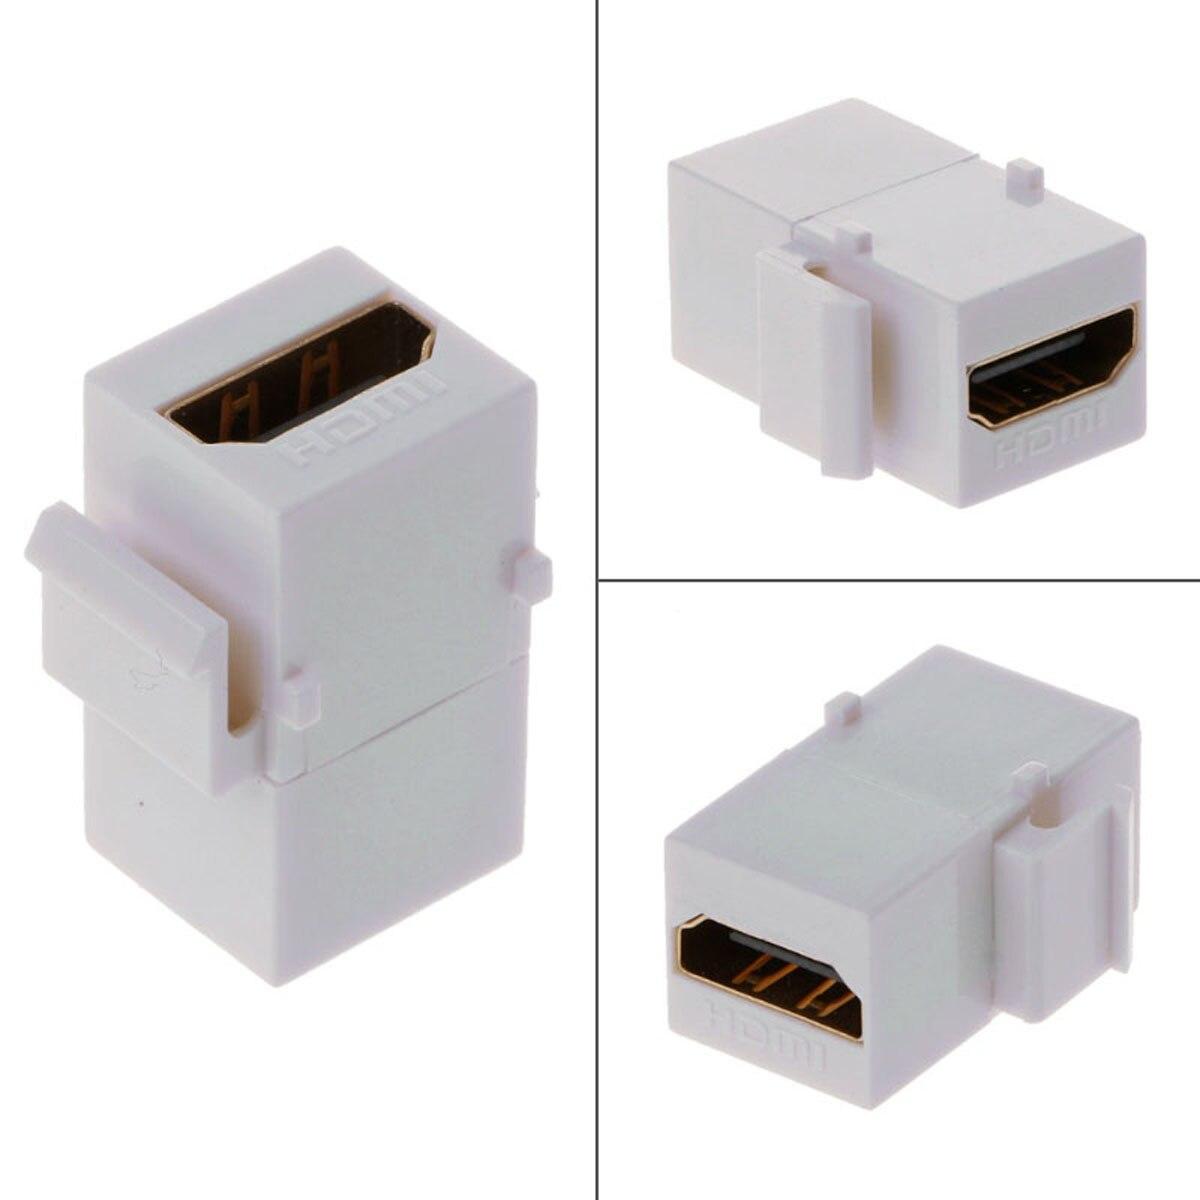 Cism fêmea f/f keystone jack acoplador para hdmi 1.4 snap-in adaptador fêmea para placa de parede cor branca